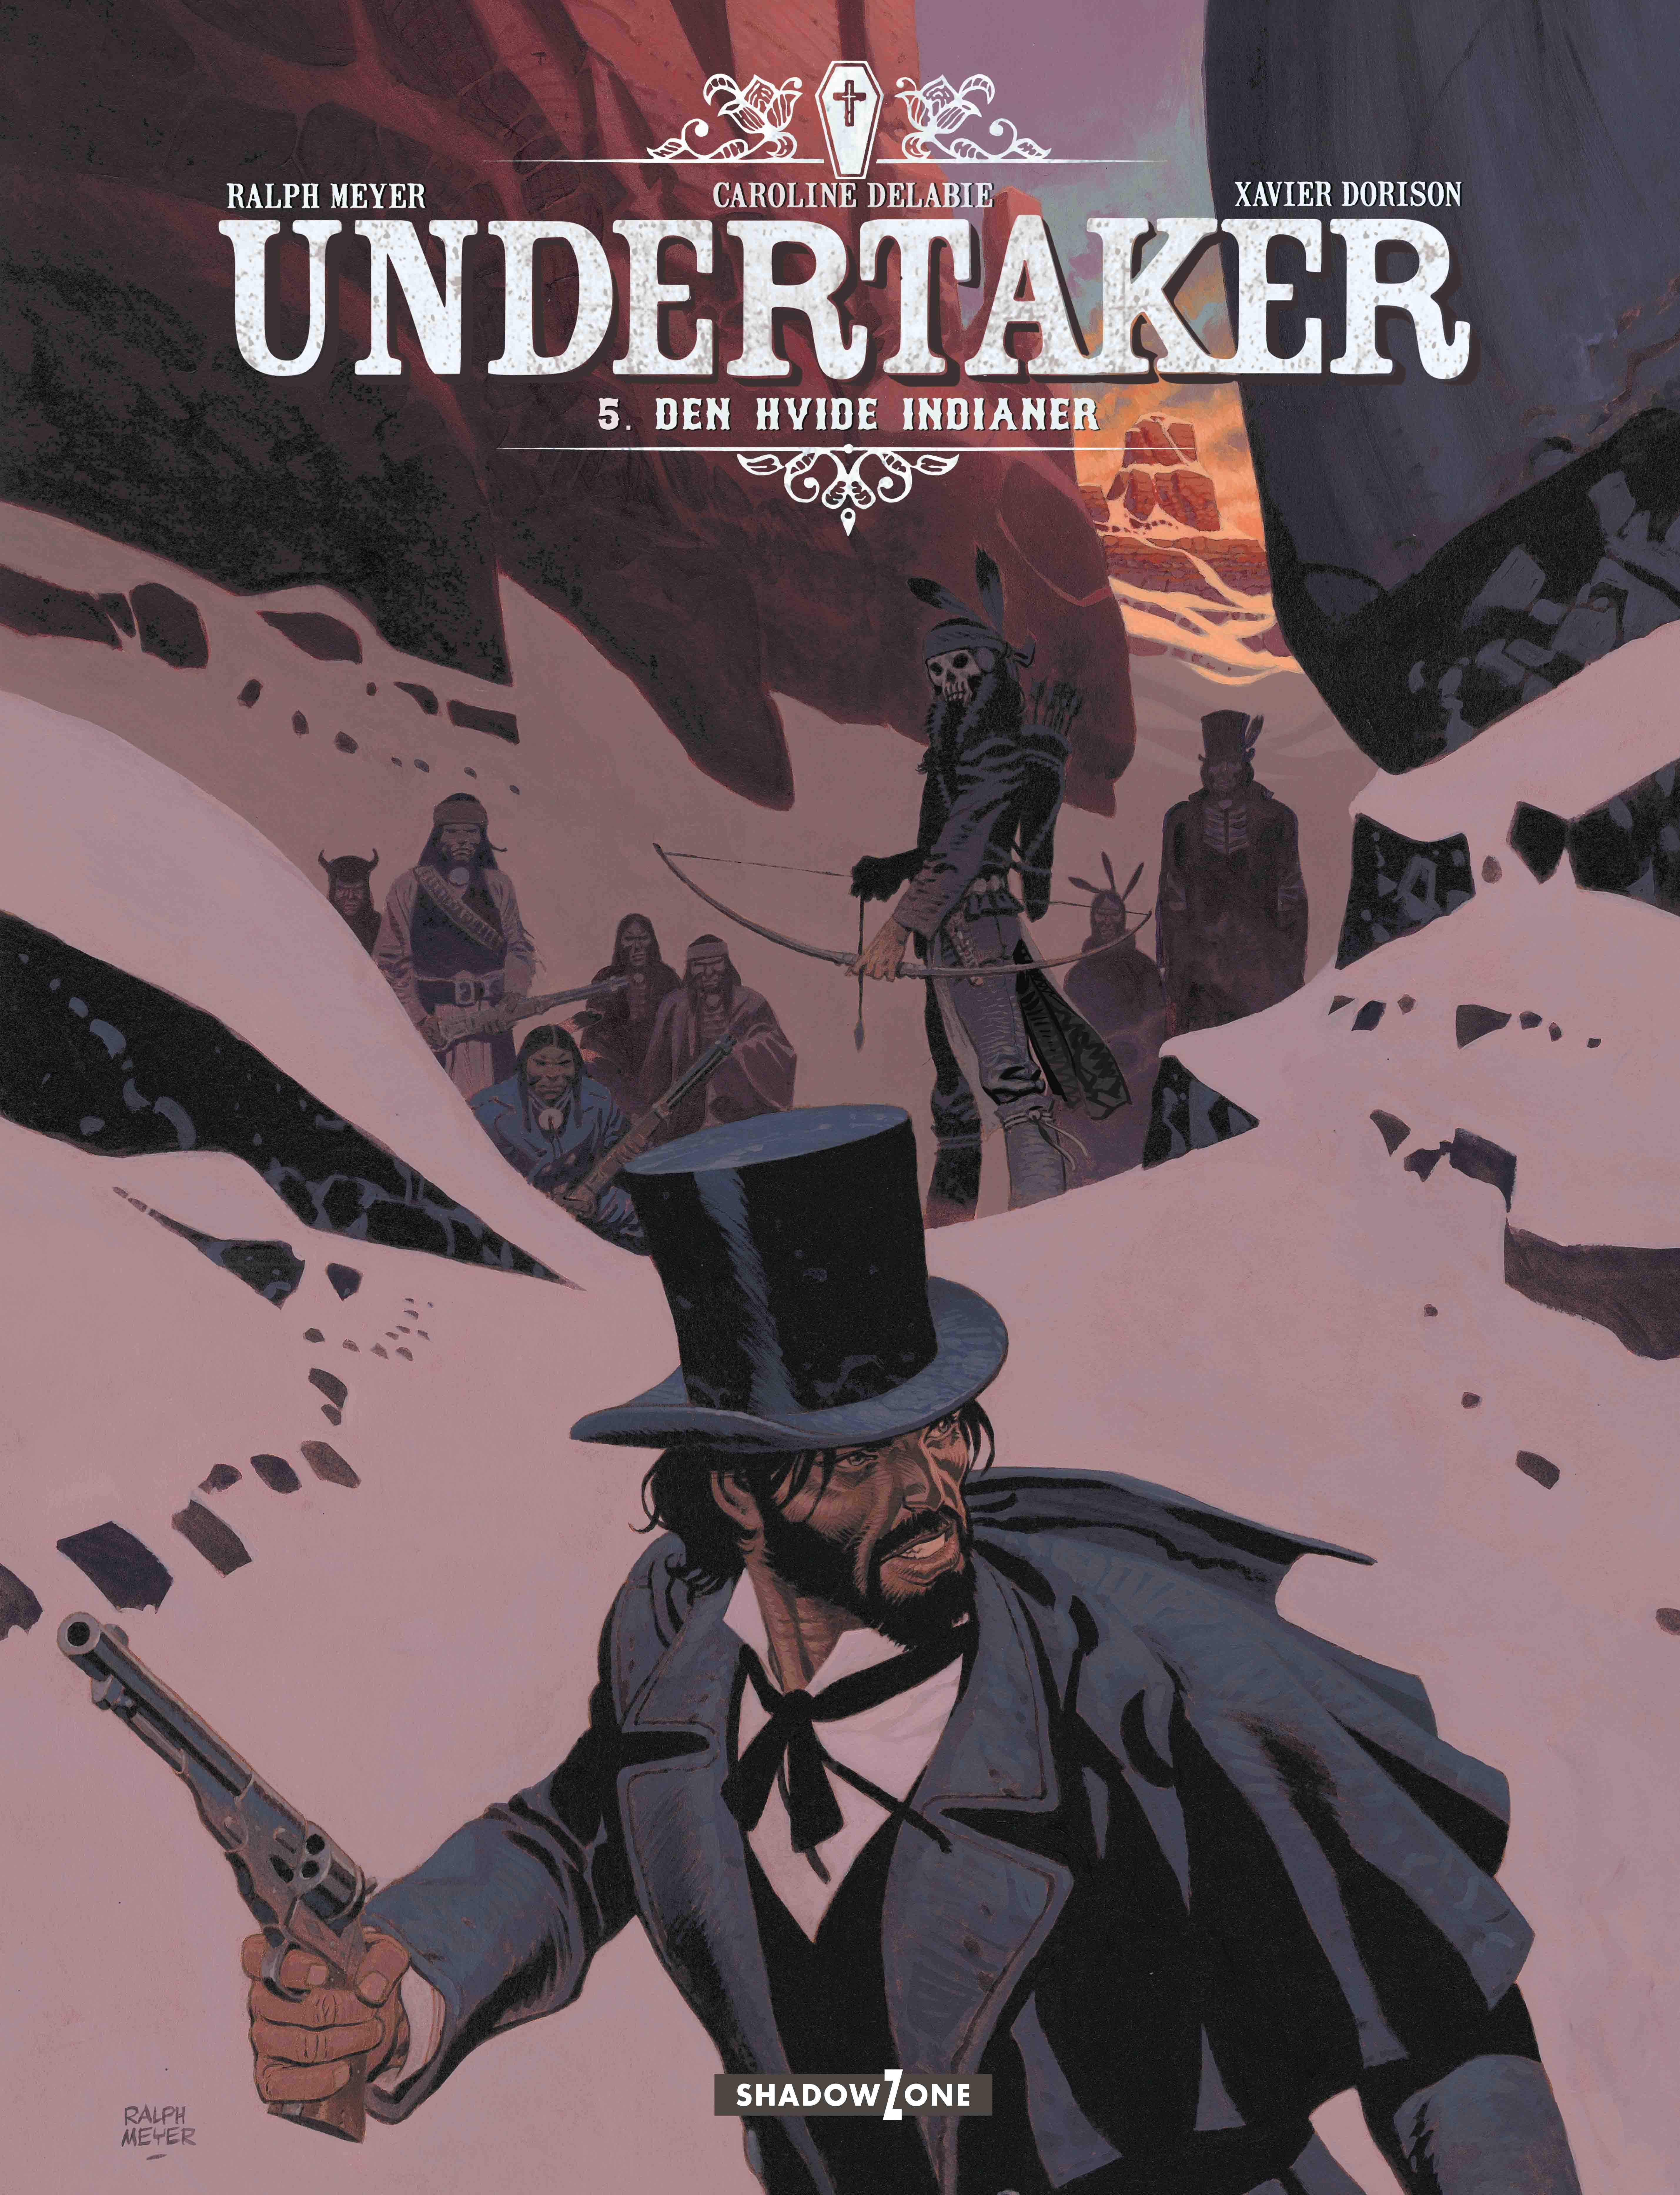 Undertaker: Undertaker 5: Den hvide indianer - Ralph Meyer Xavier Dorison - Bøger - Shadow Zone Media - 9788792048394 - 29/5-2020